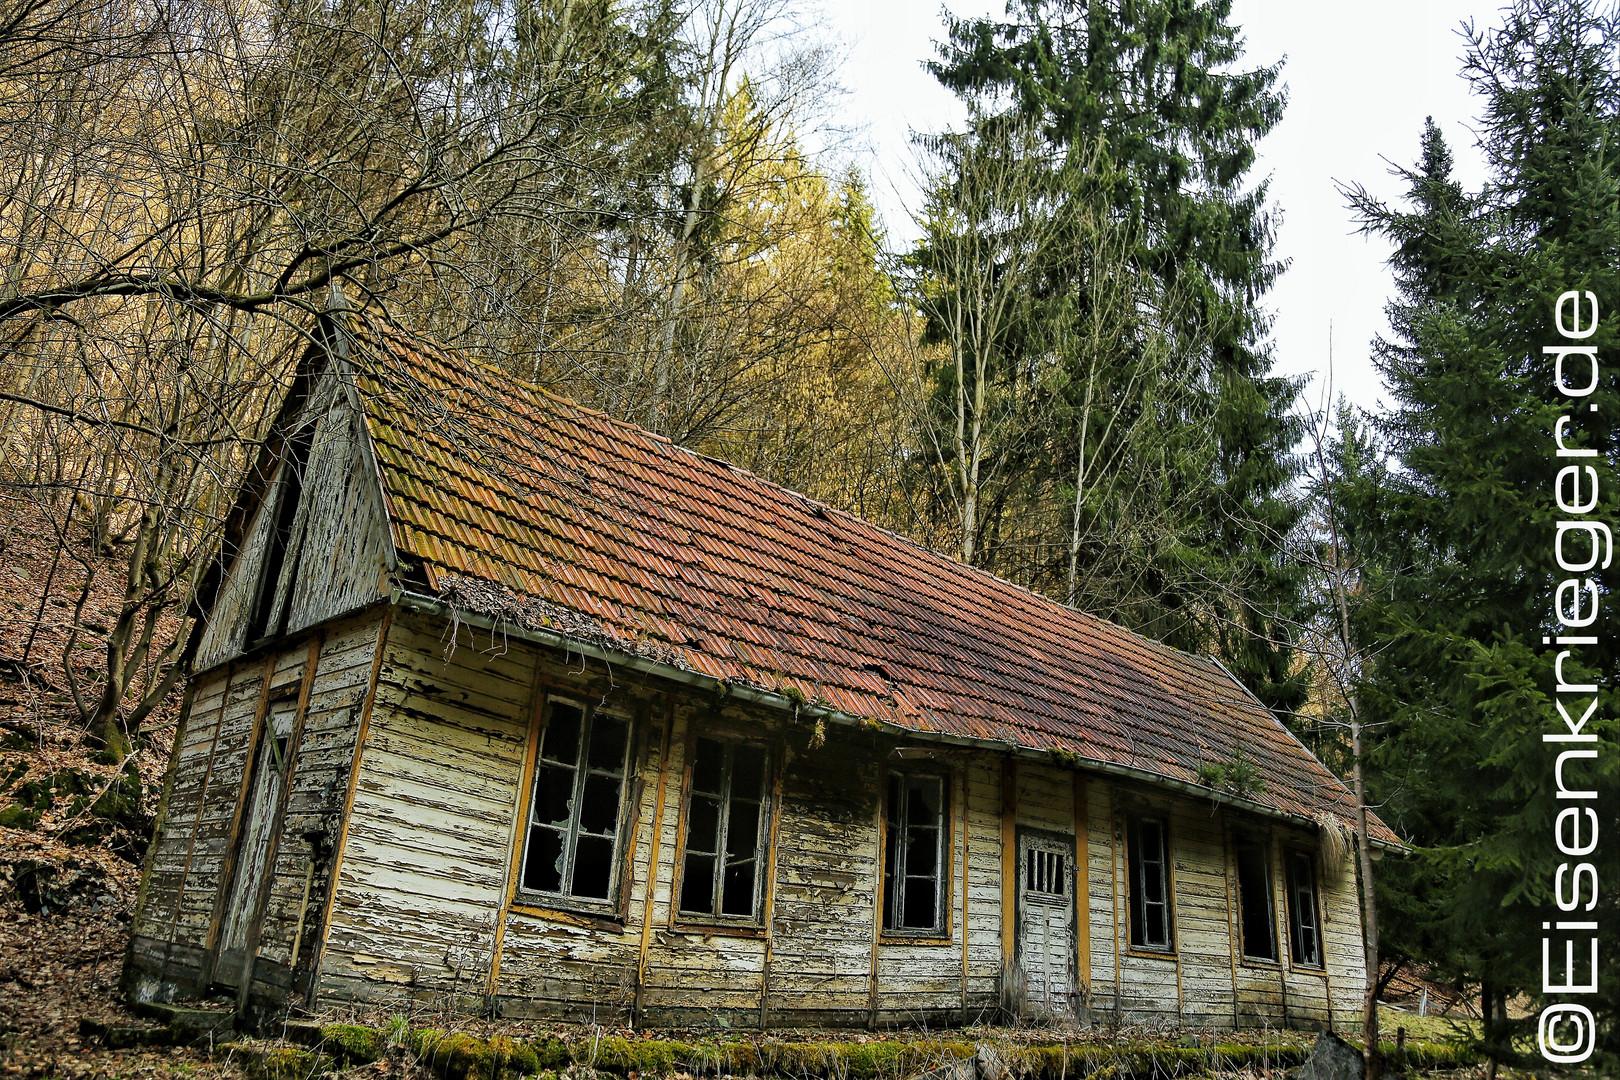 "Lost places in Forest ""southharz"" verlorene Plätze im Südharz"